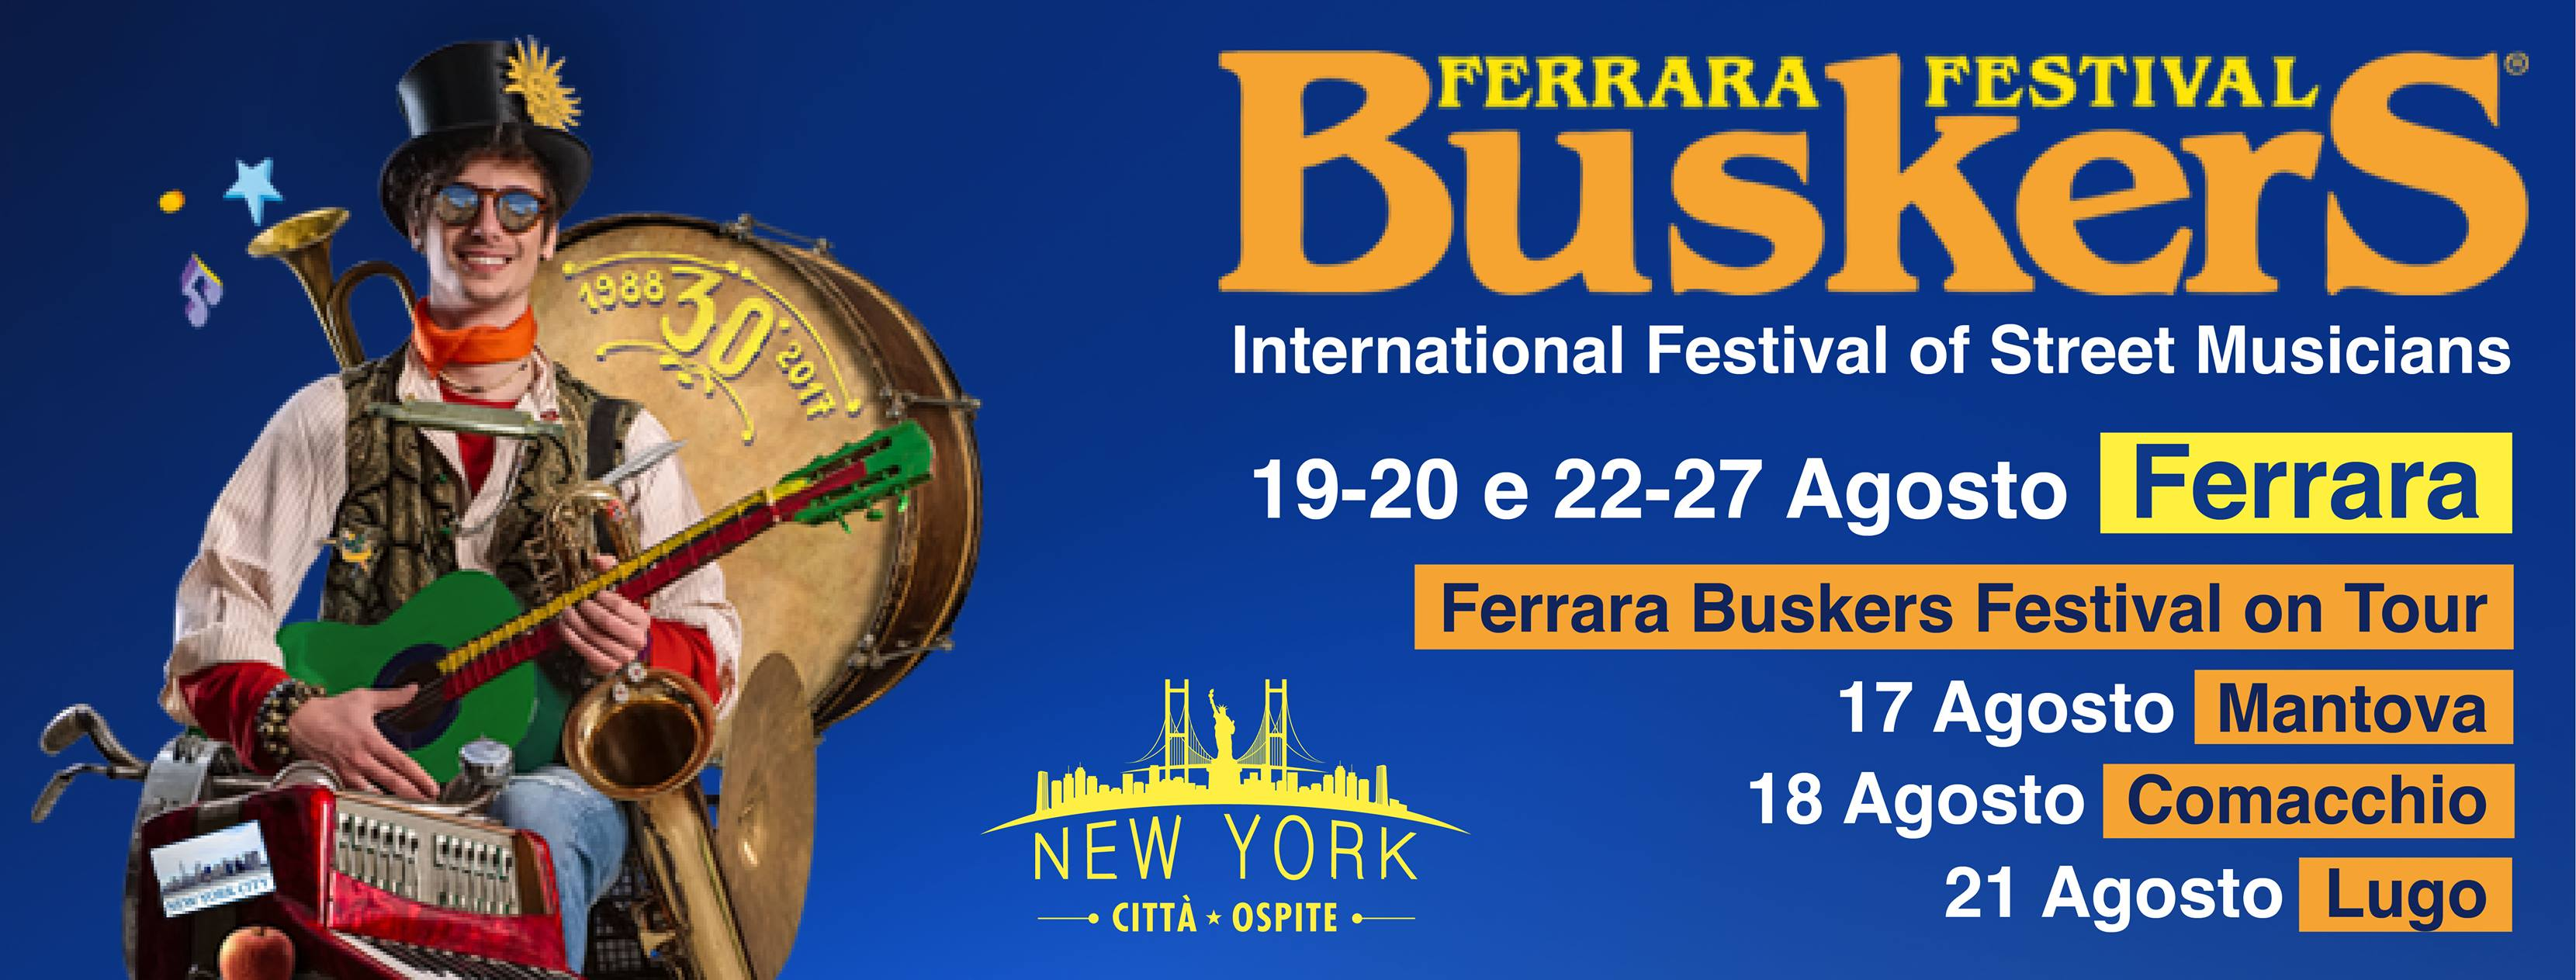 Ferrara Buskers Festival Banner